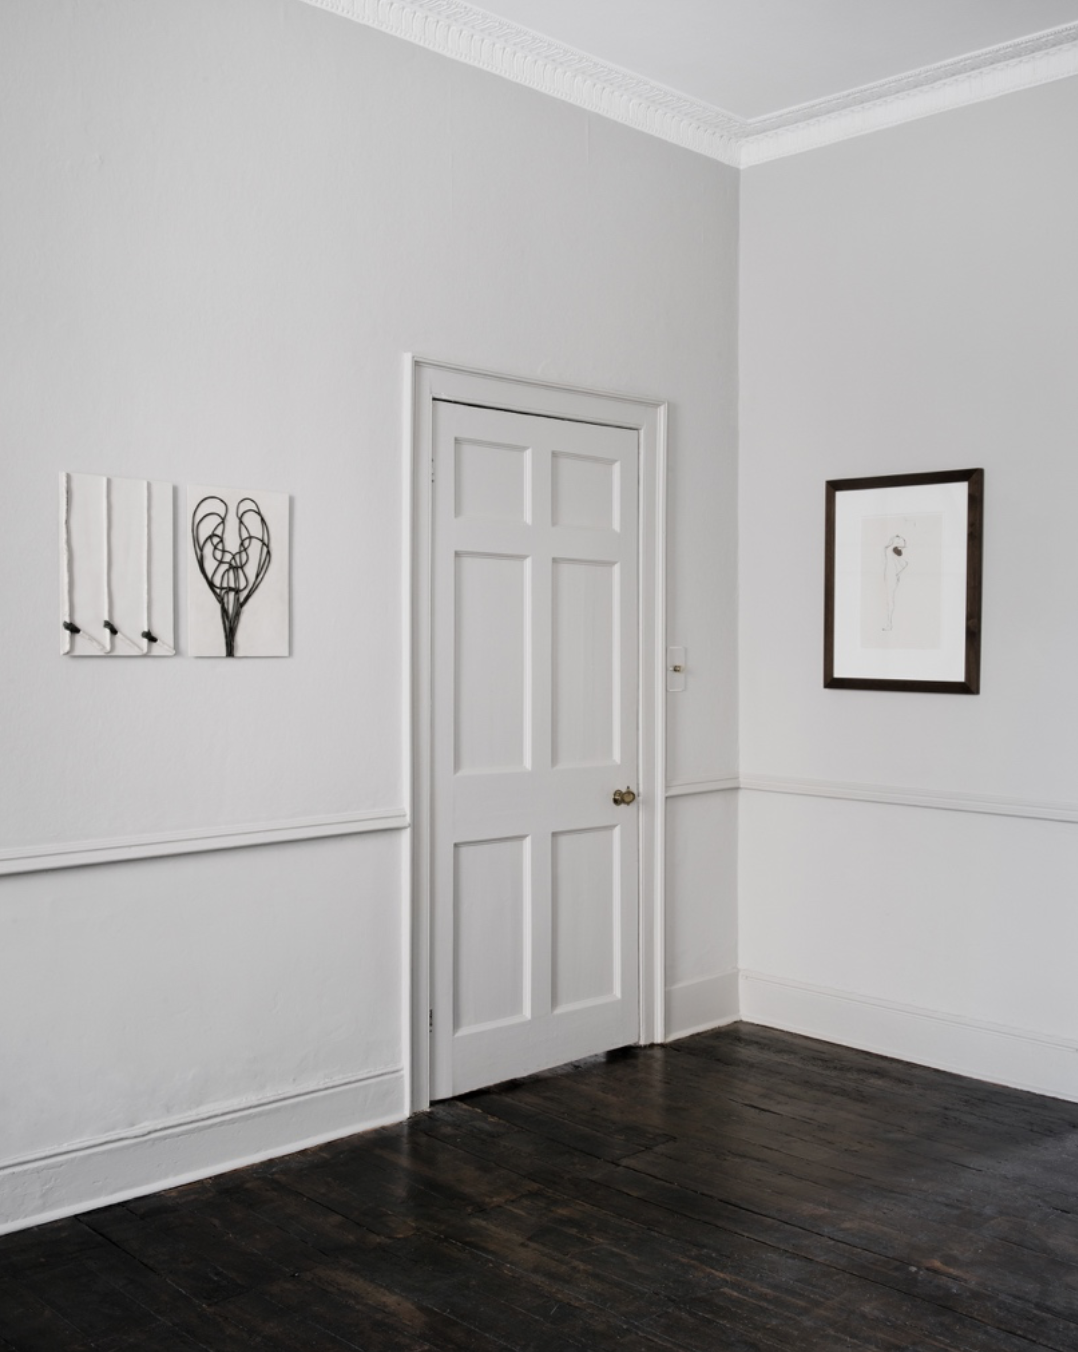 Installation view - Enrico David